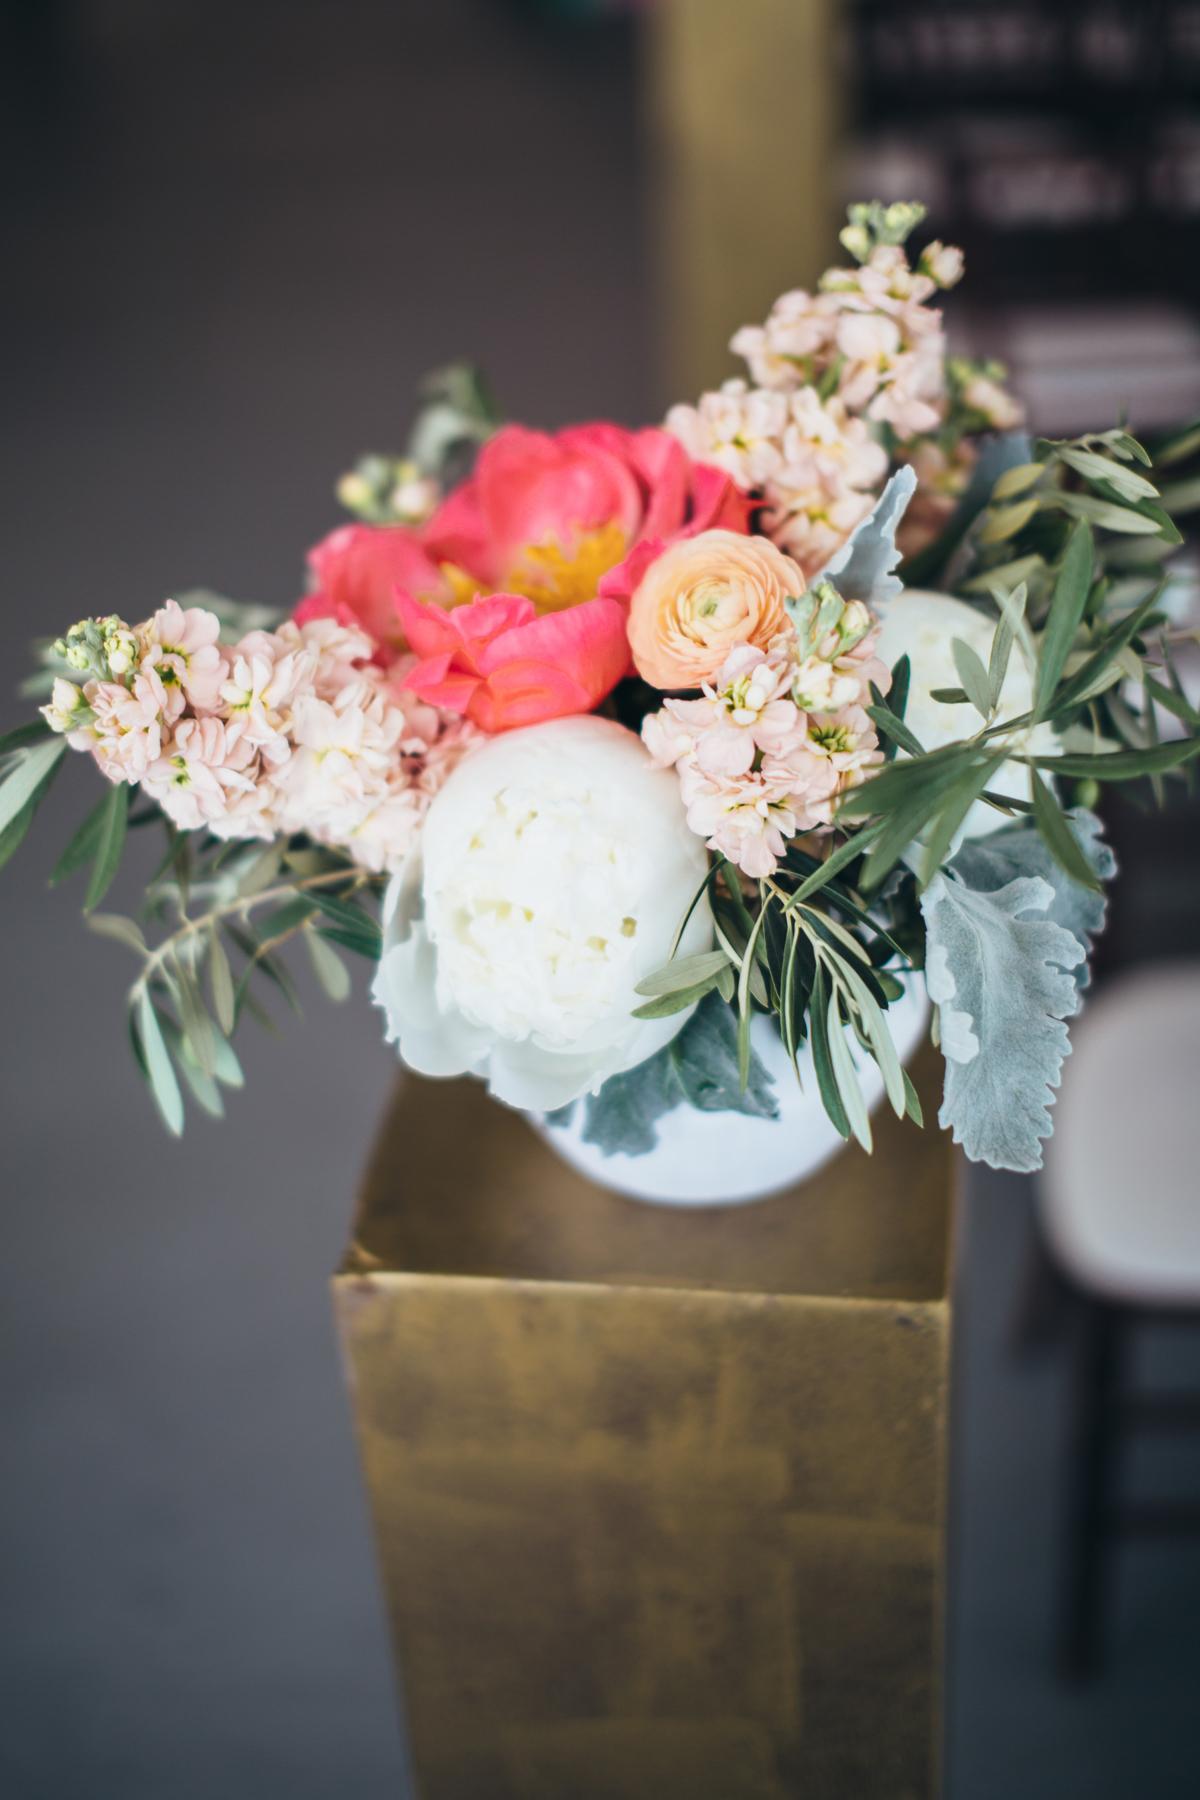 Wedding Ceremony Flowers with Peonies